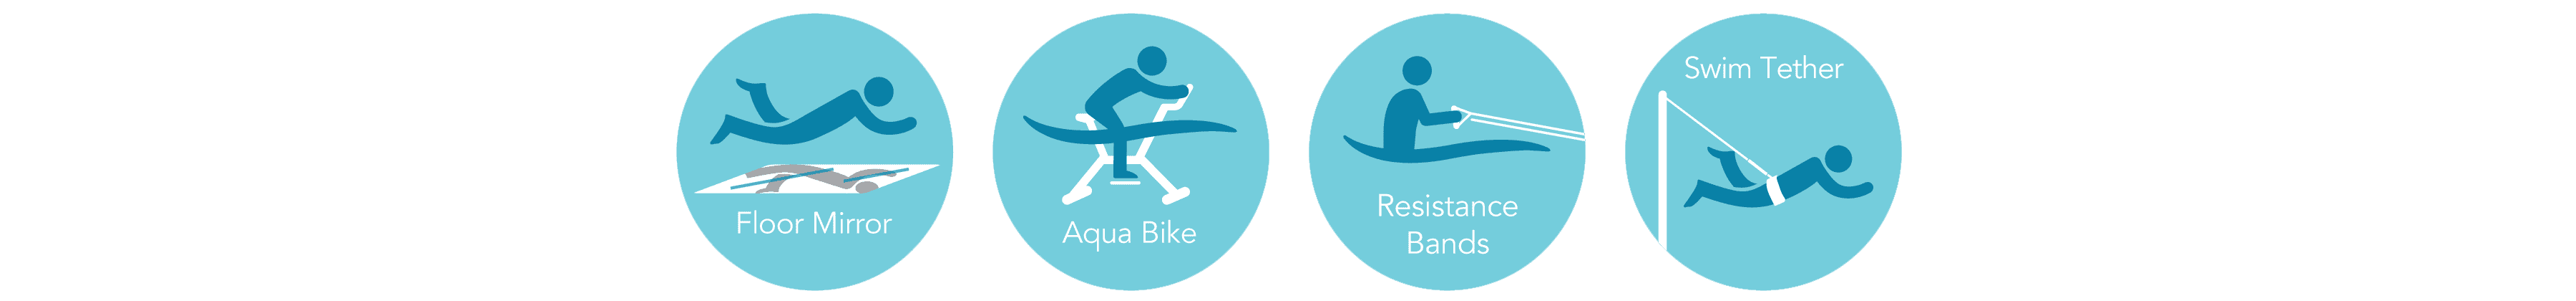 fitness-accessories-recsport